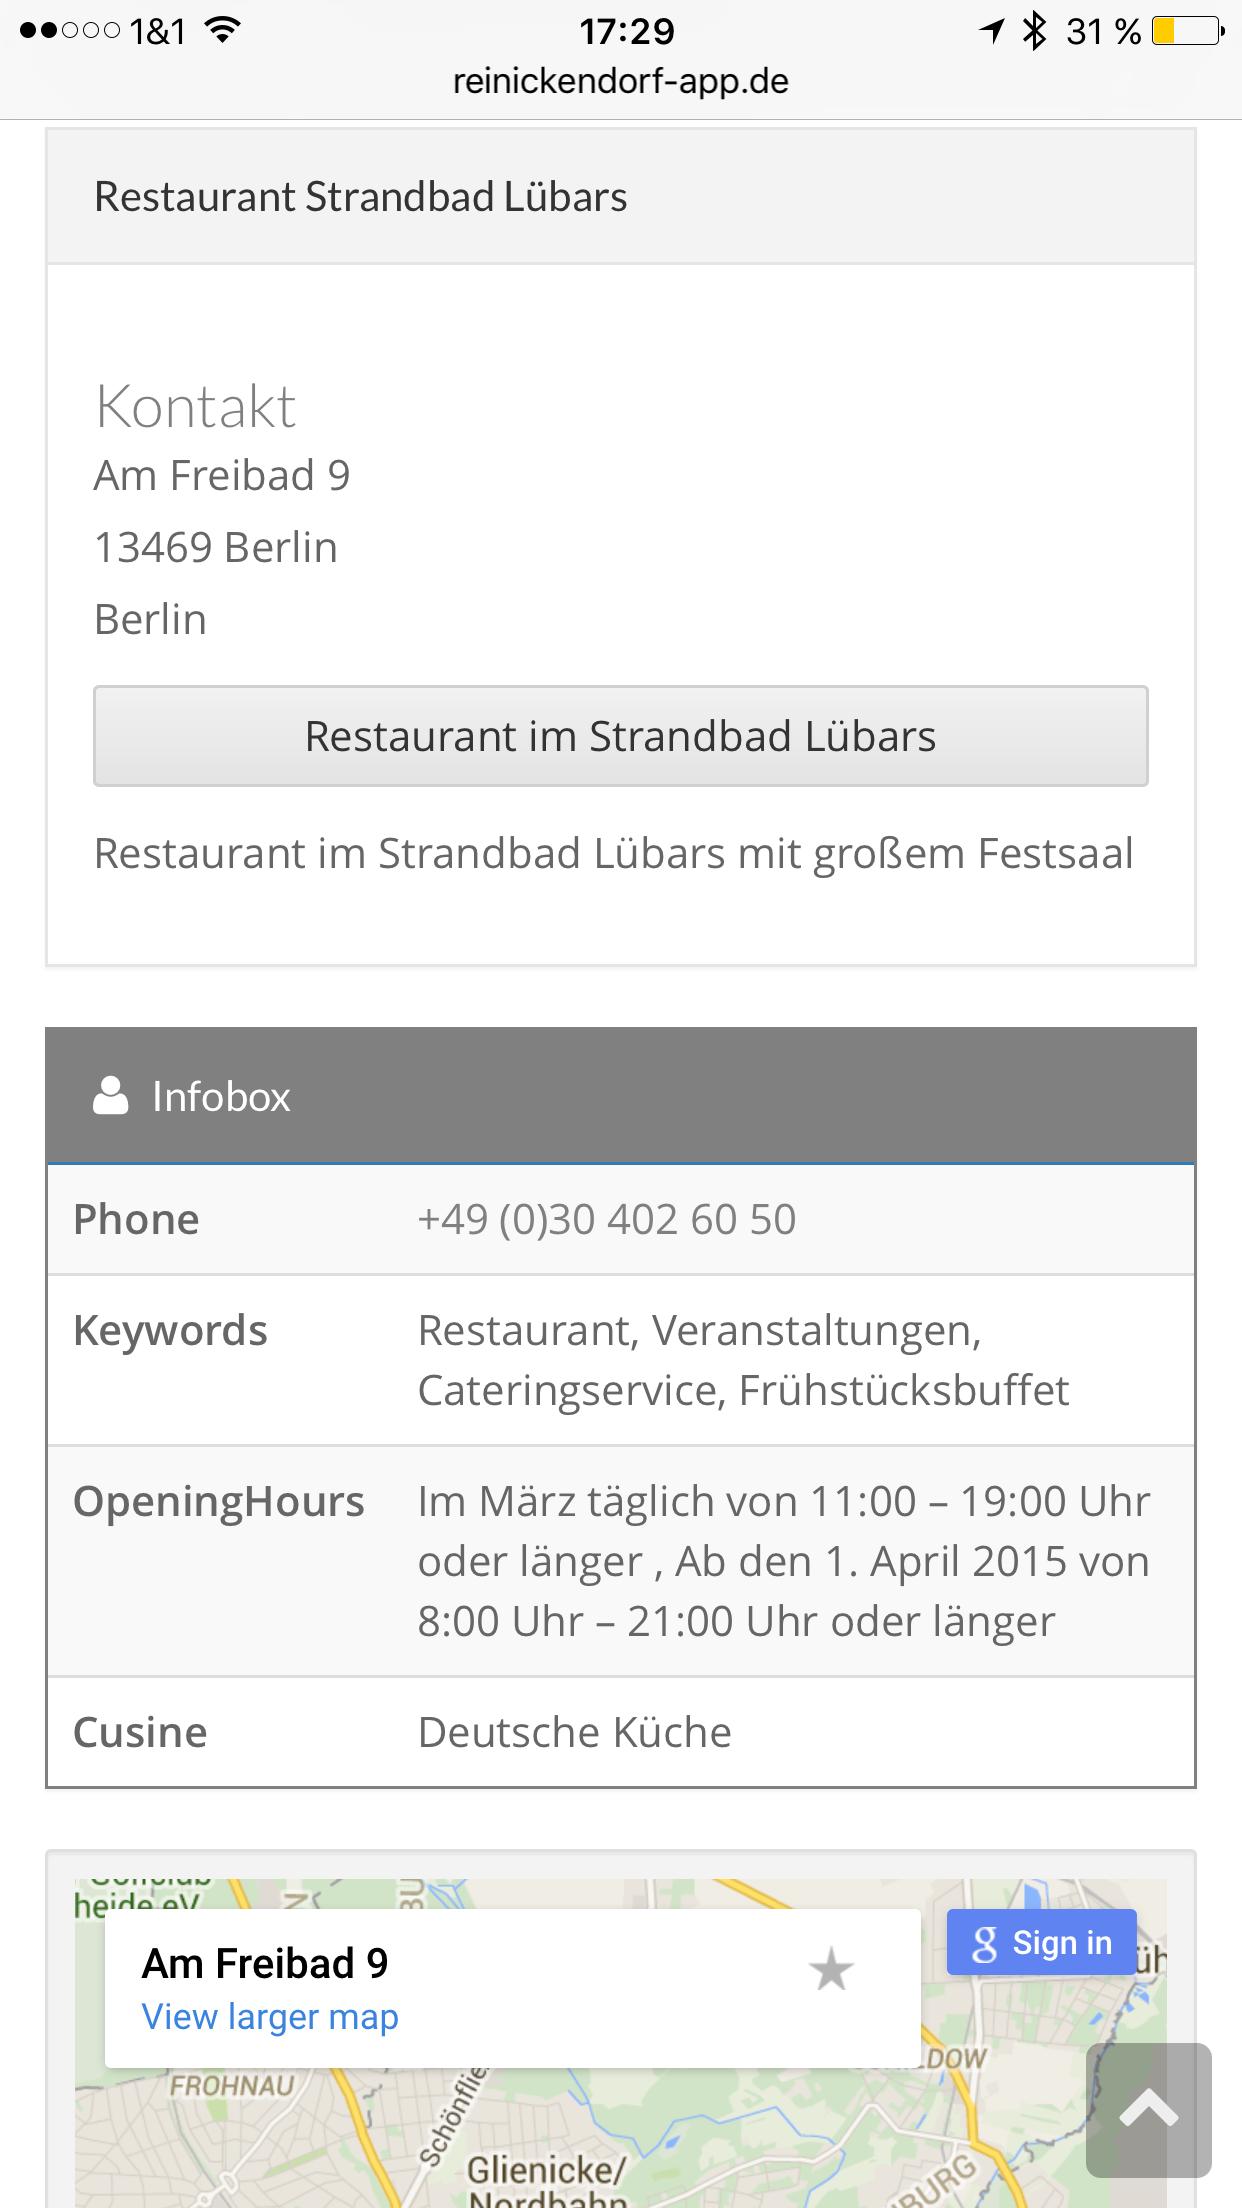 Reinickendorf App - Strandbad Lübars Infos